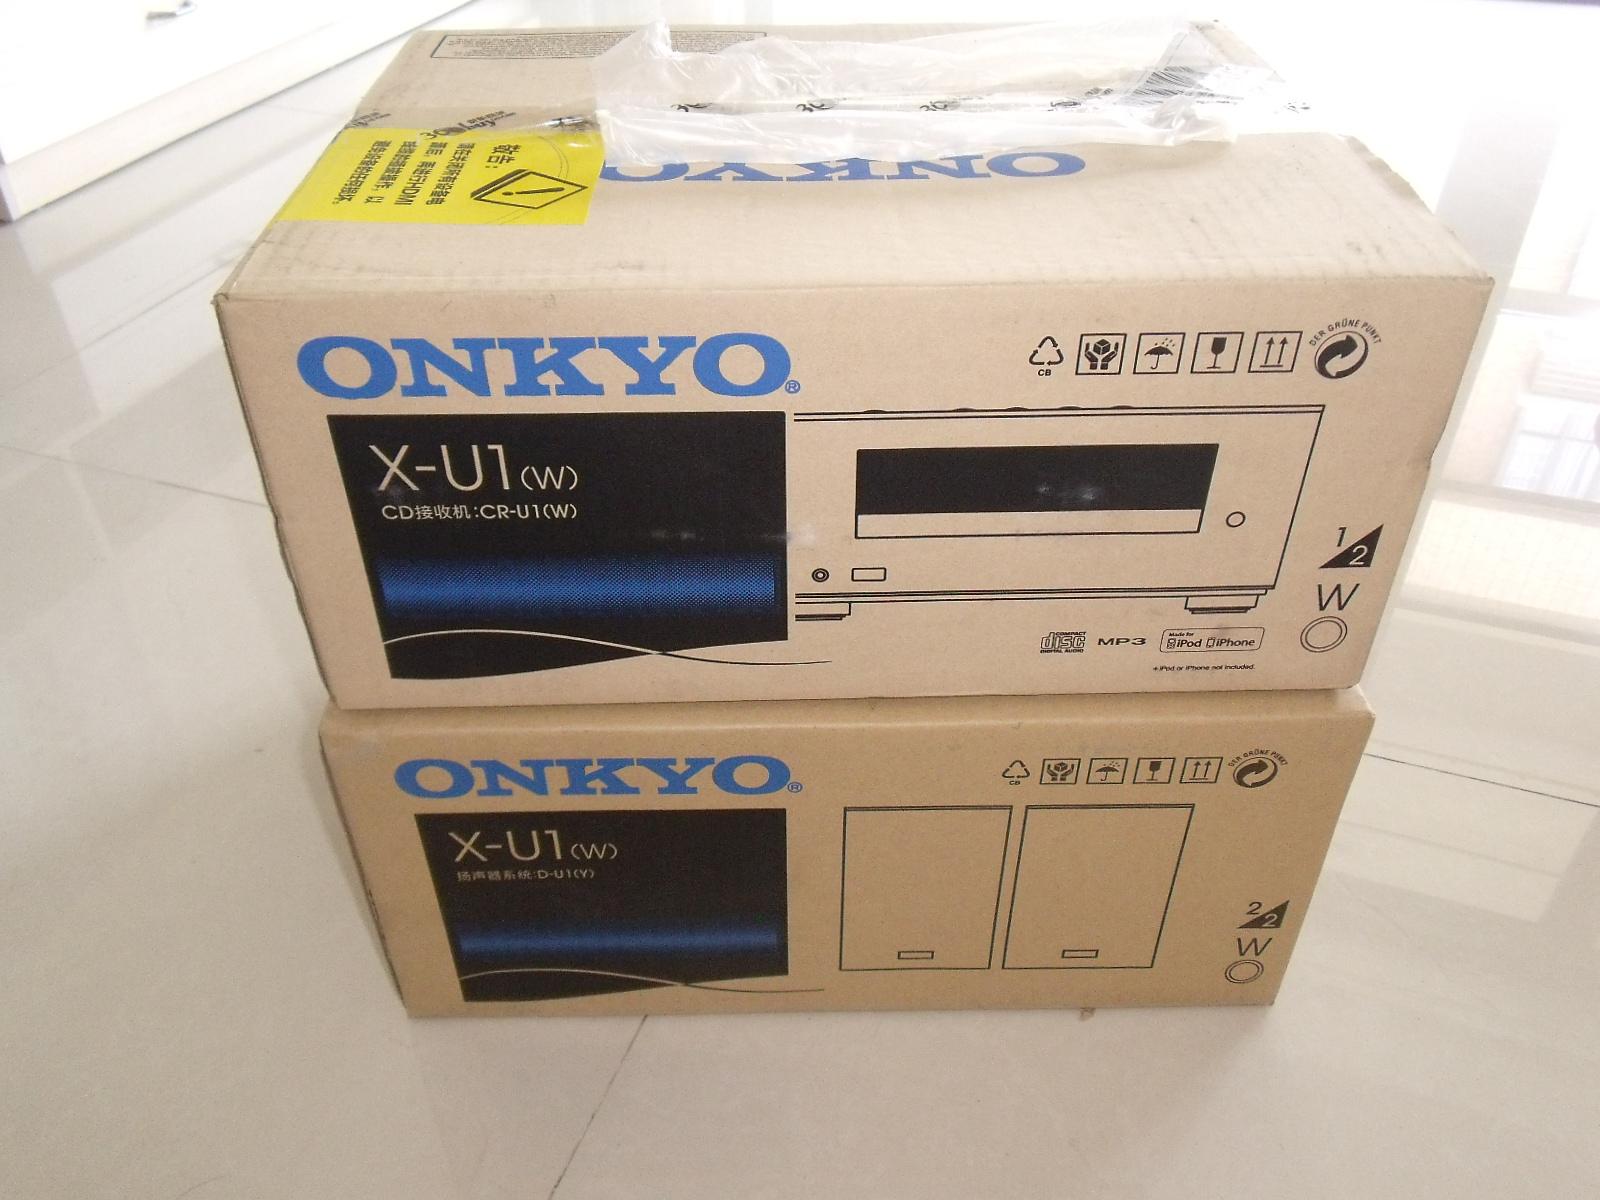 2009 nike hyperize for sale 00236903 replica